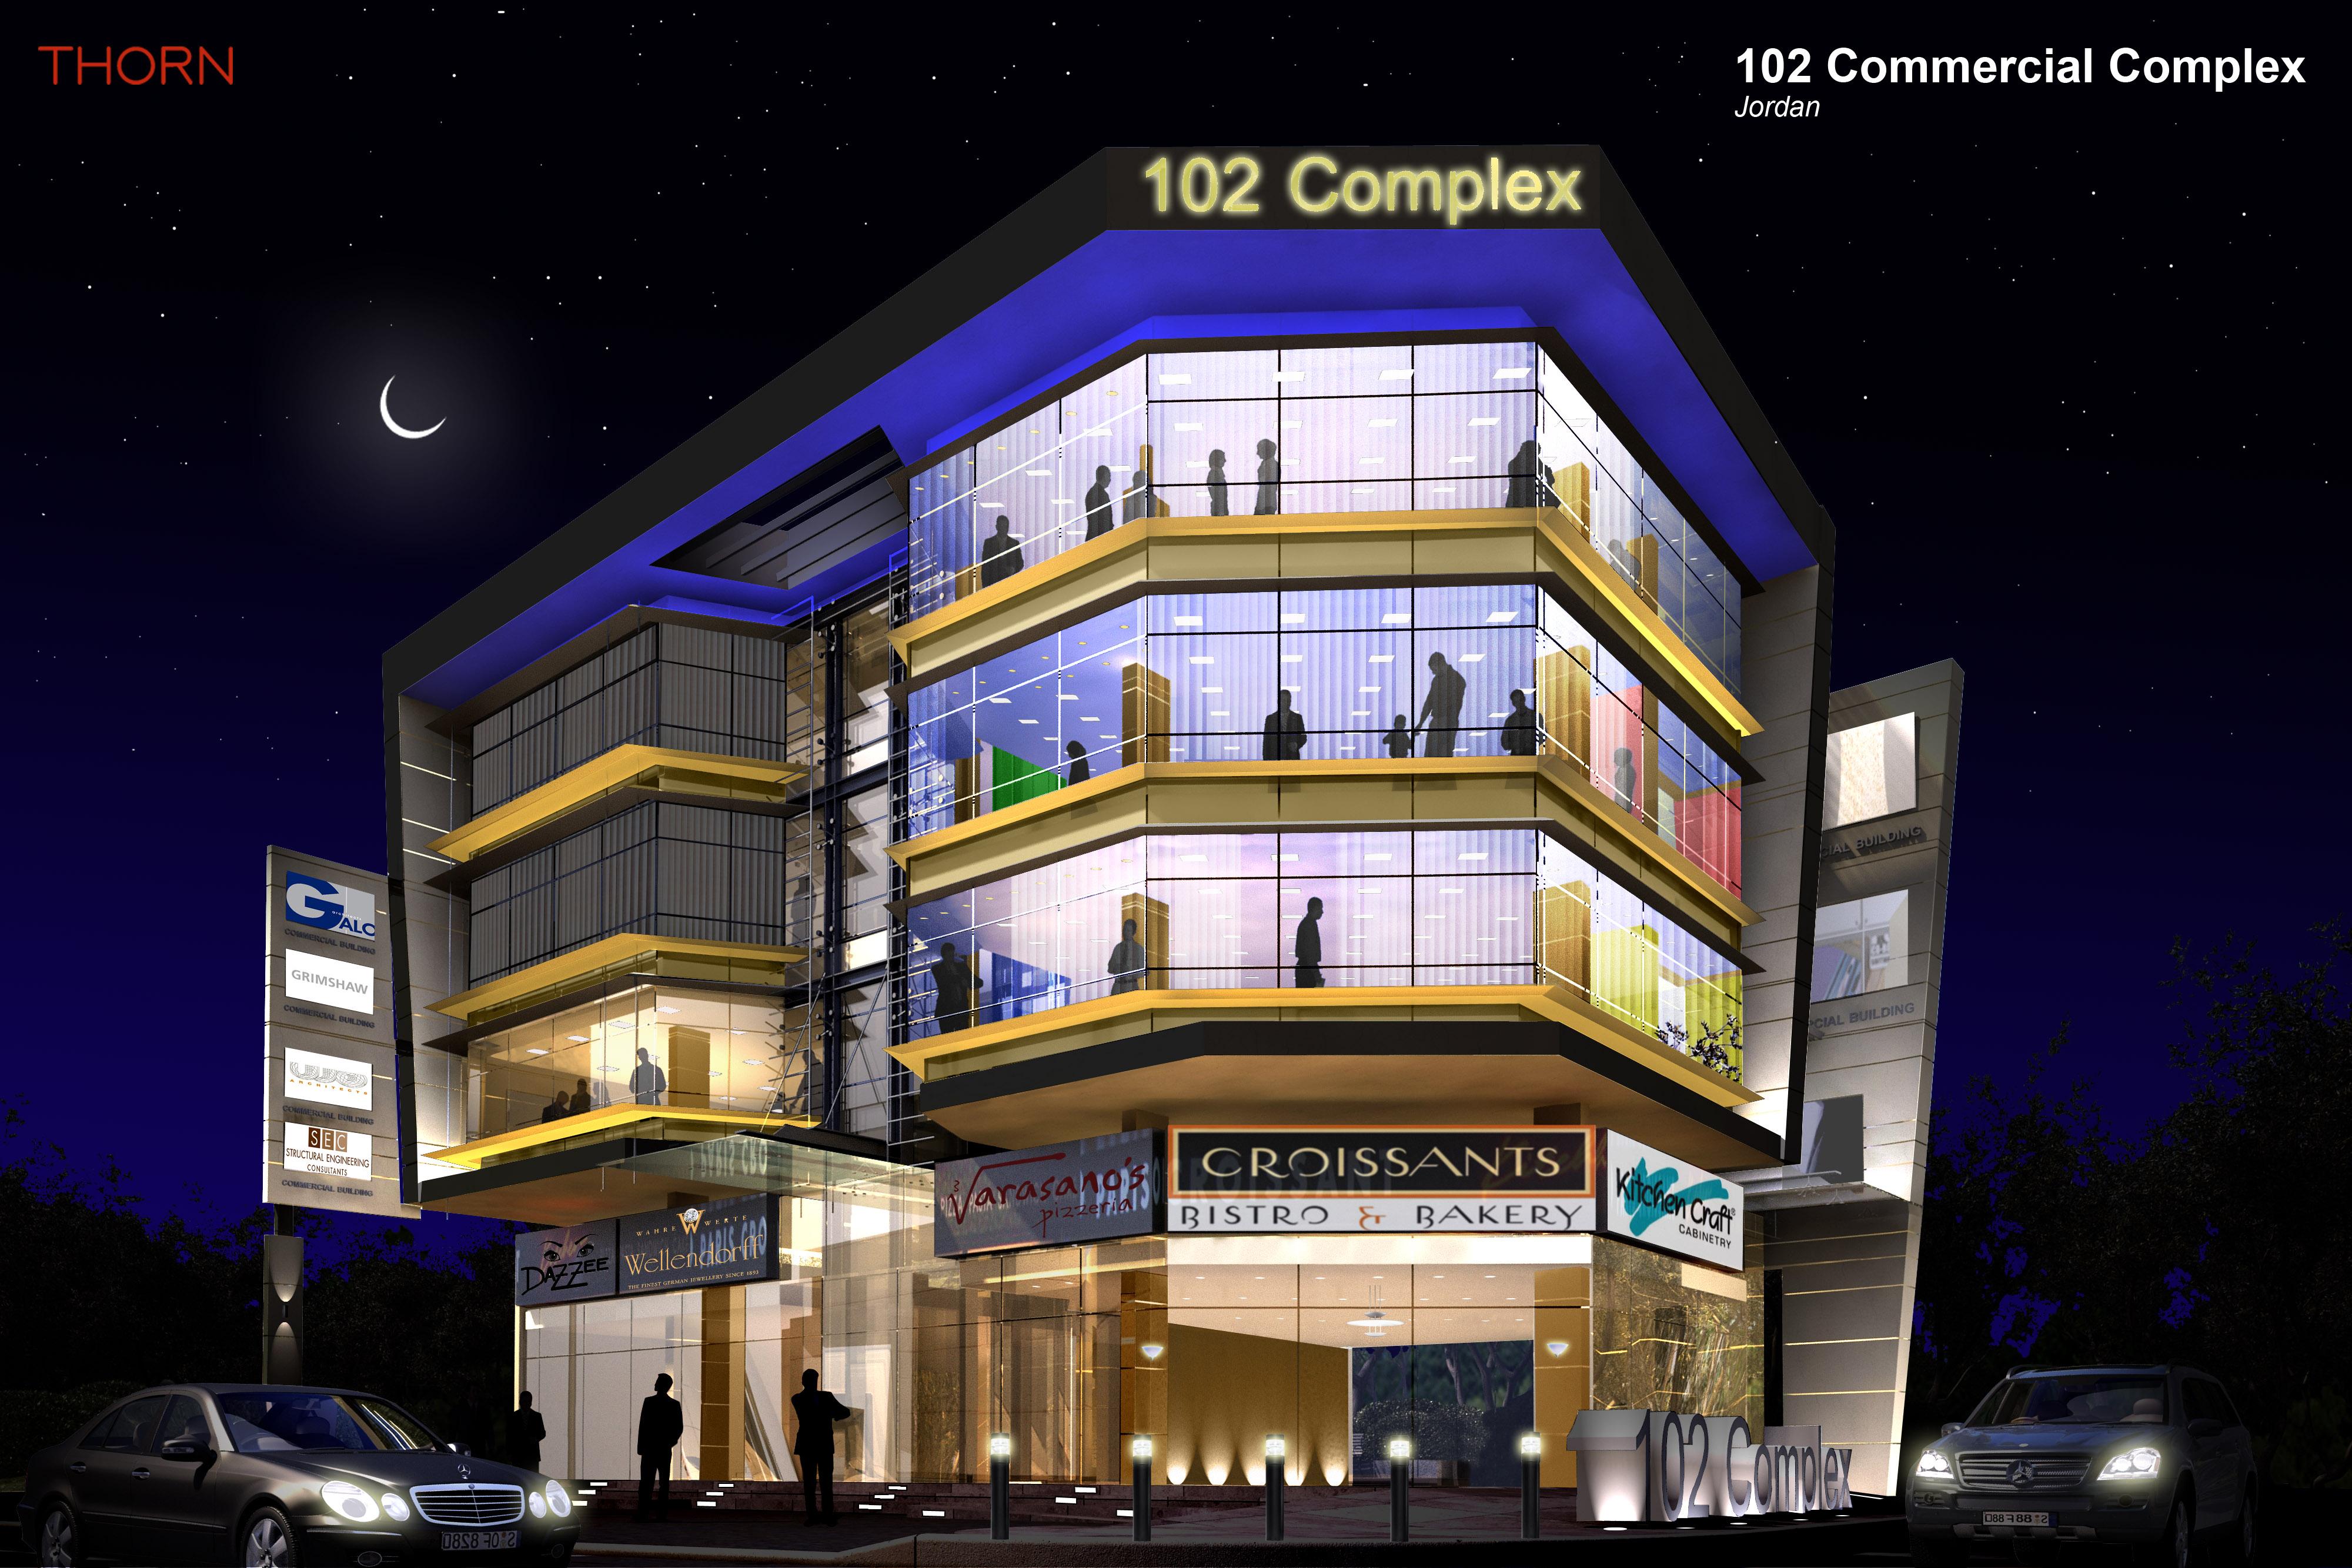 102 Commercial Complex FAcade Lighting